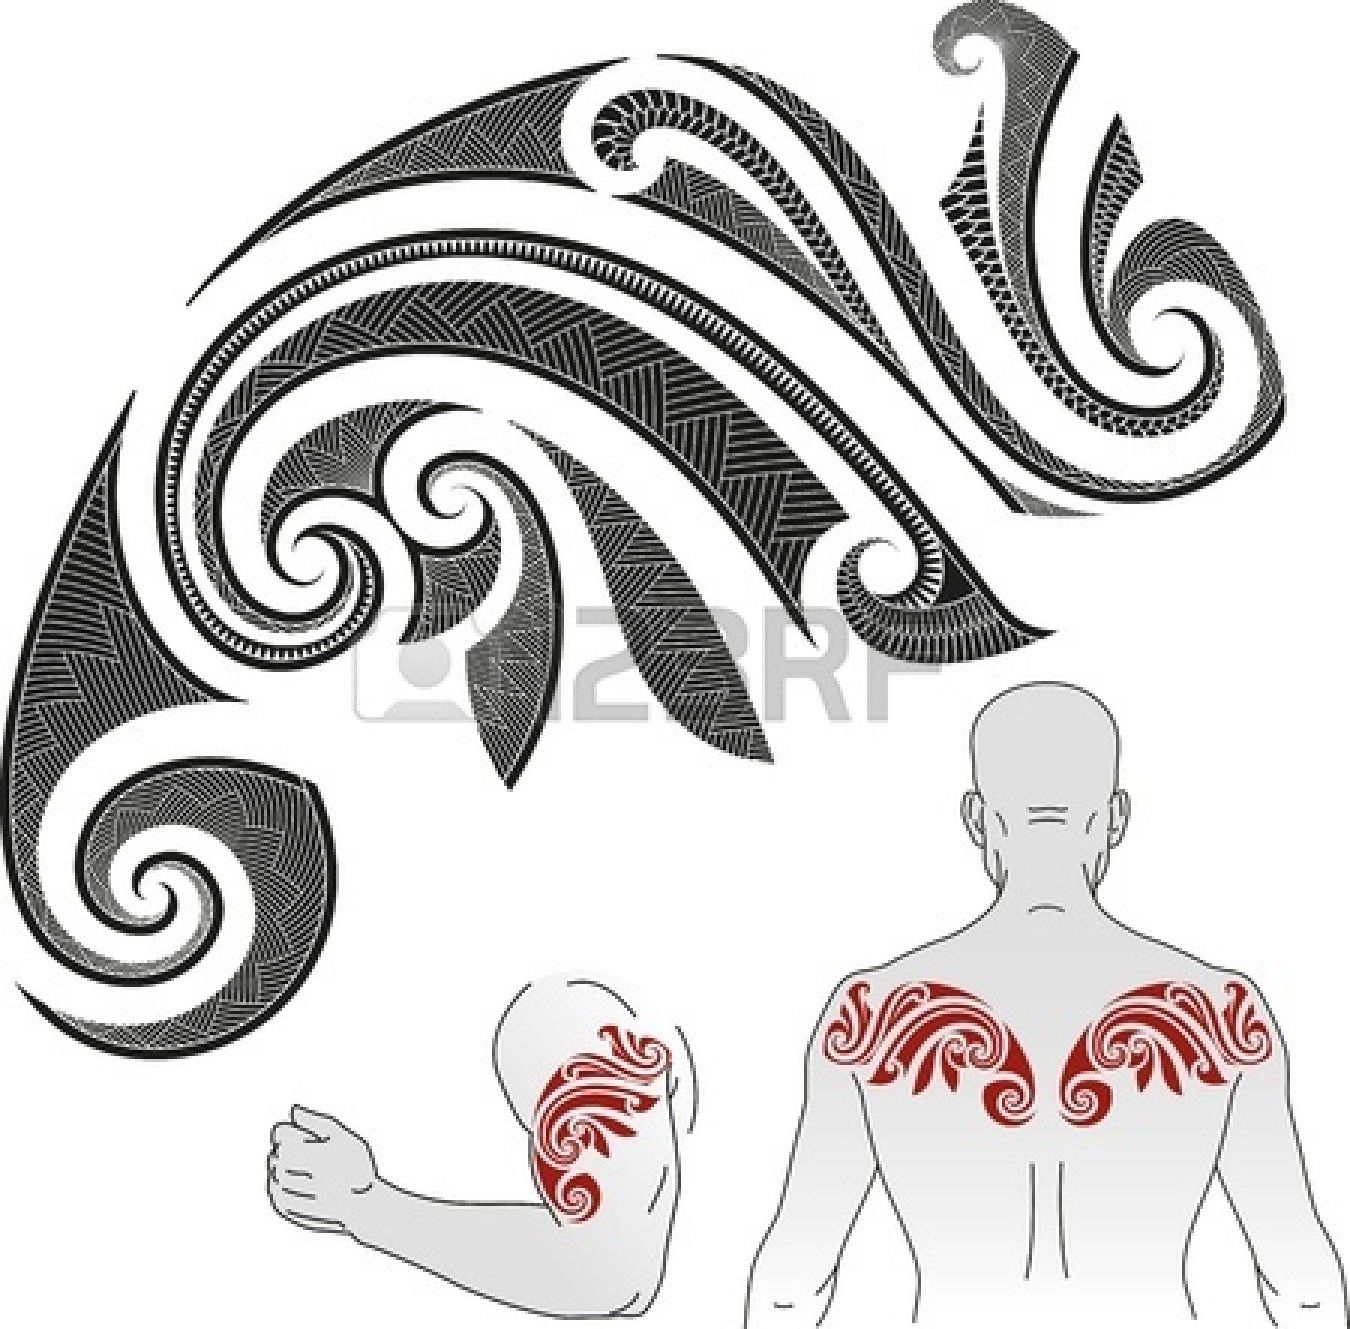 Tatouage polynesien signification symbole fashion designs - Tatouage maorie signification ...